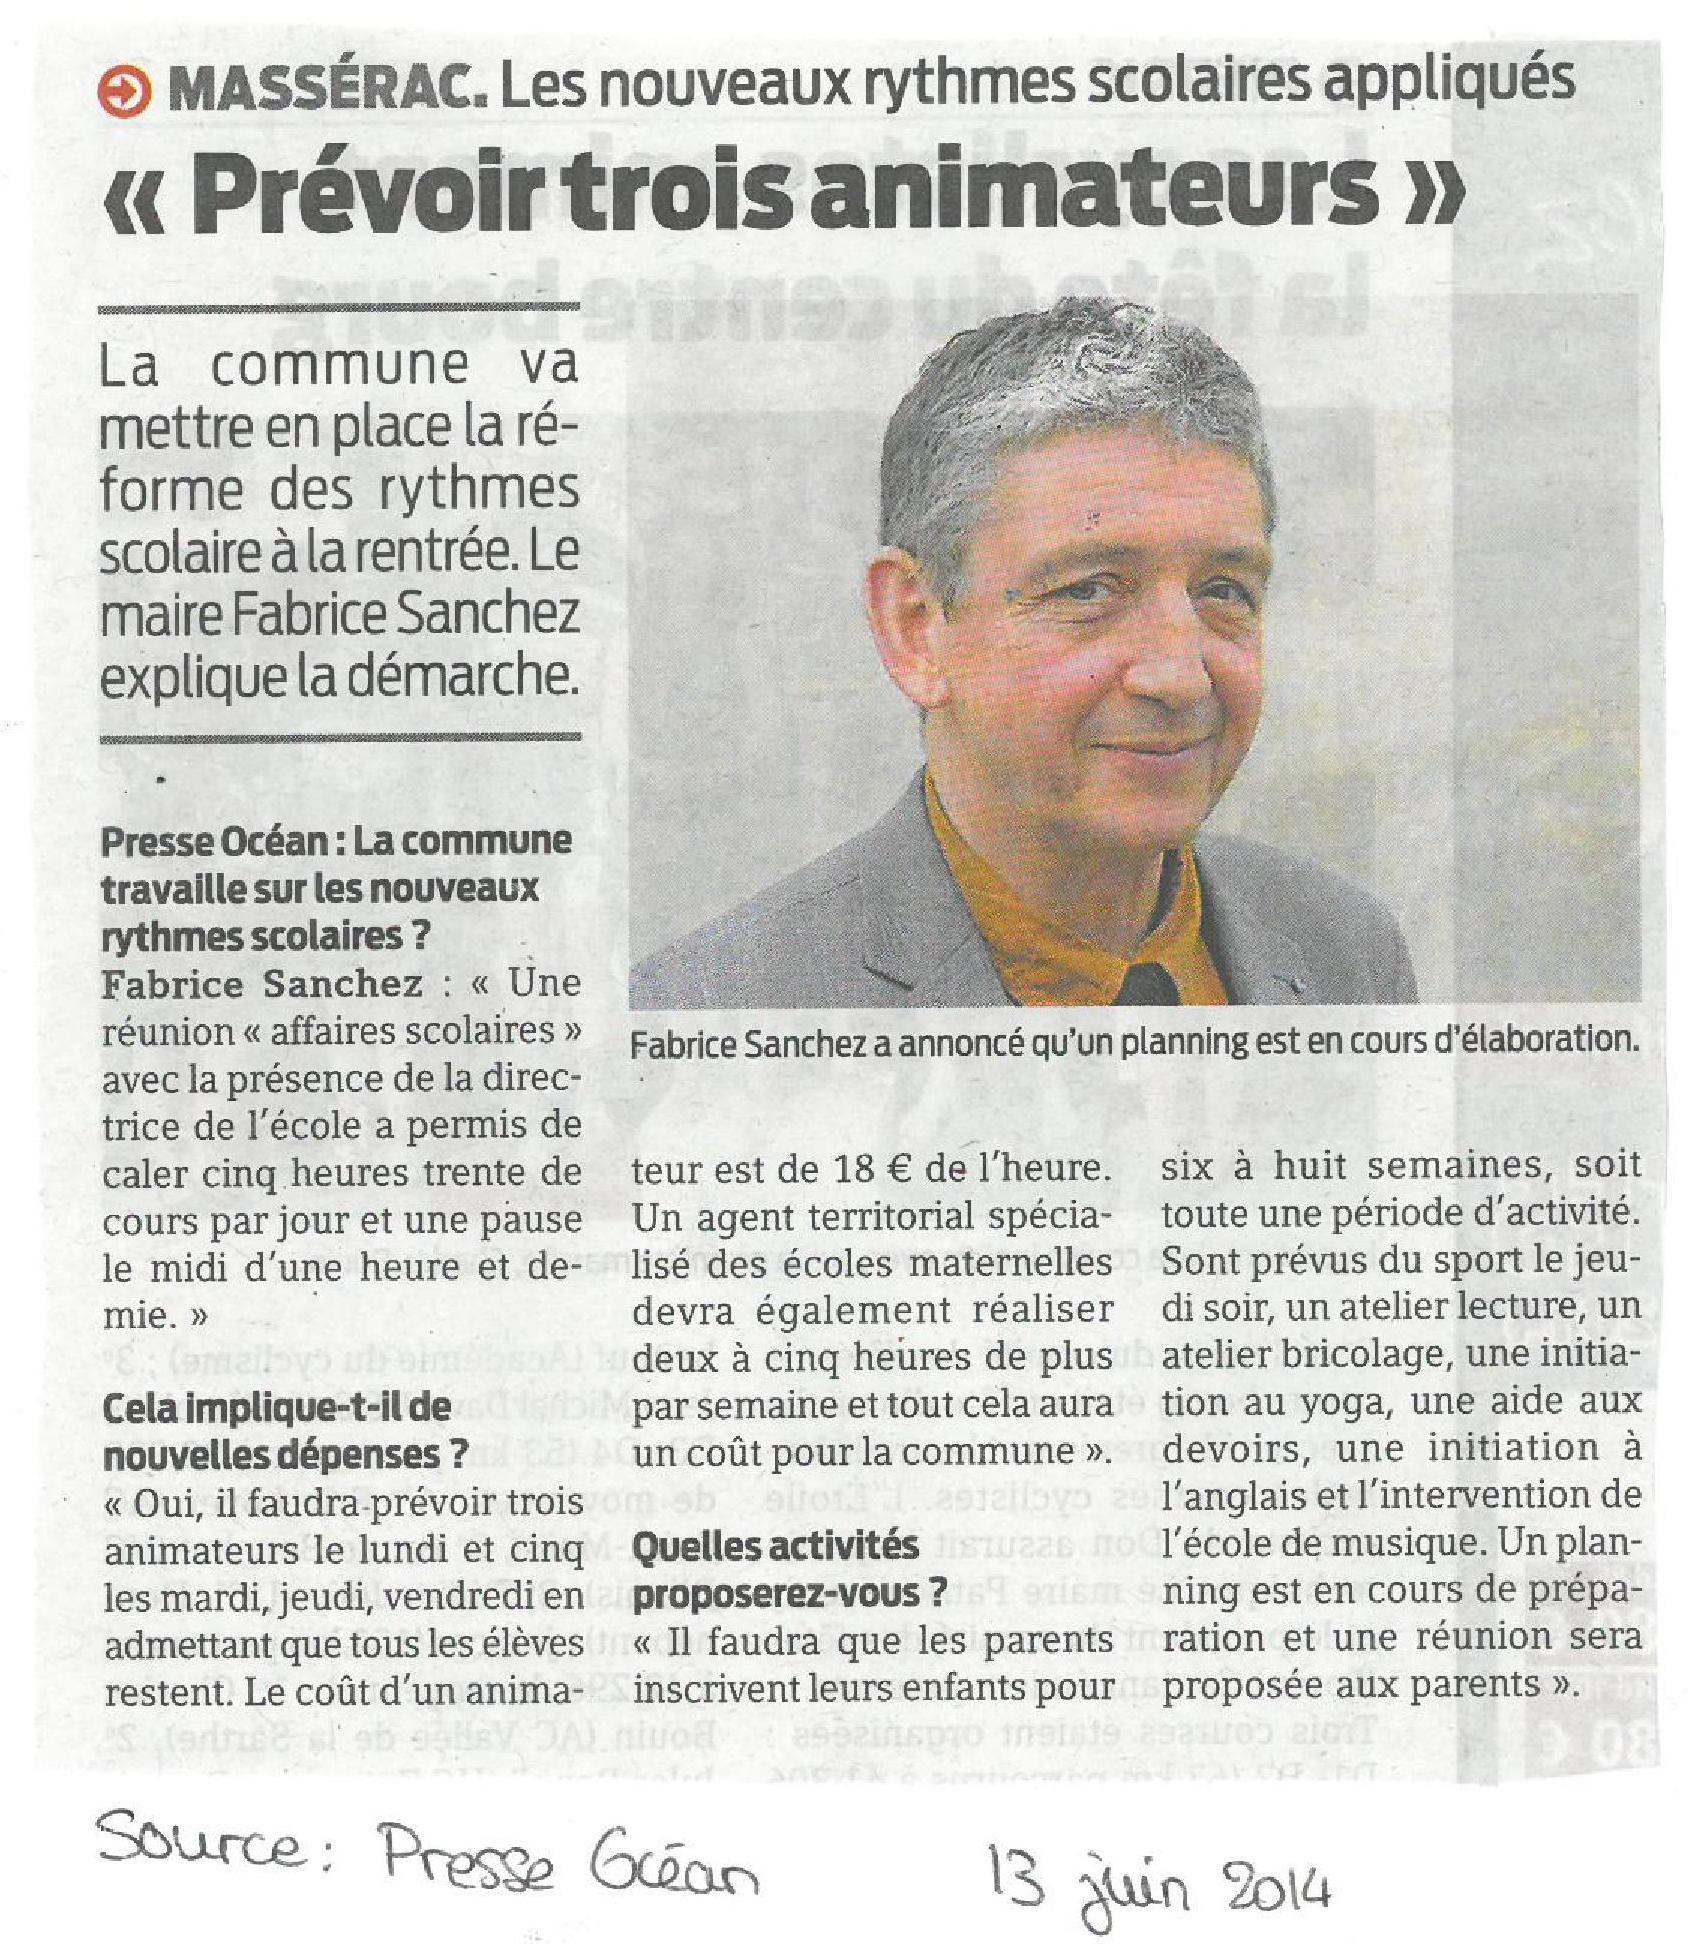 presse-ocean-13-juin-2014-page-001